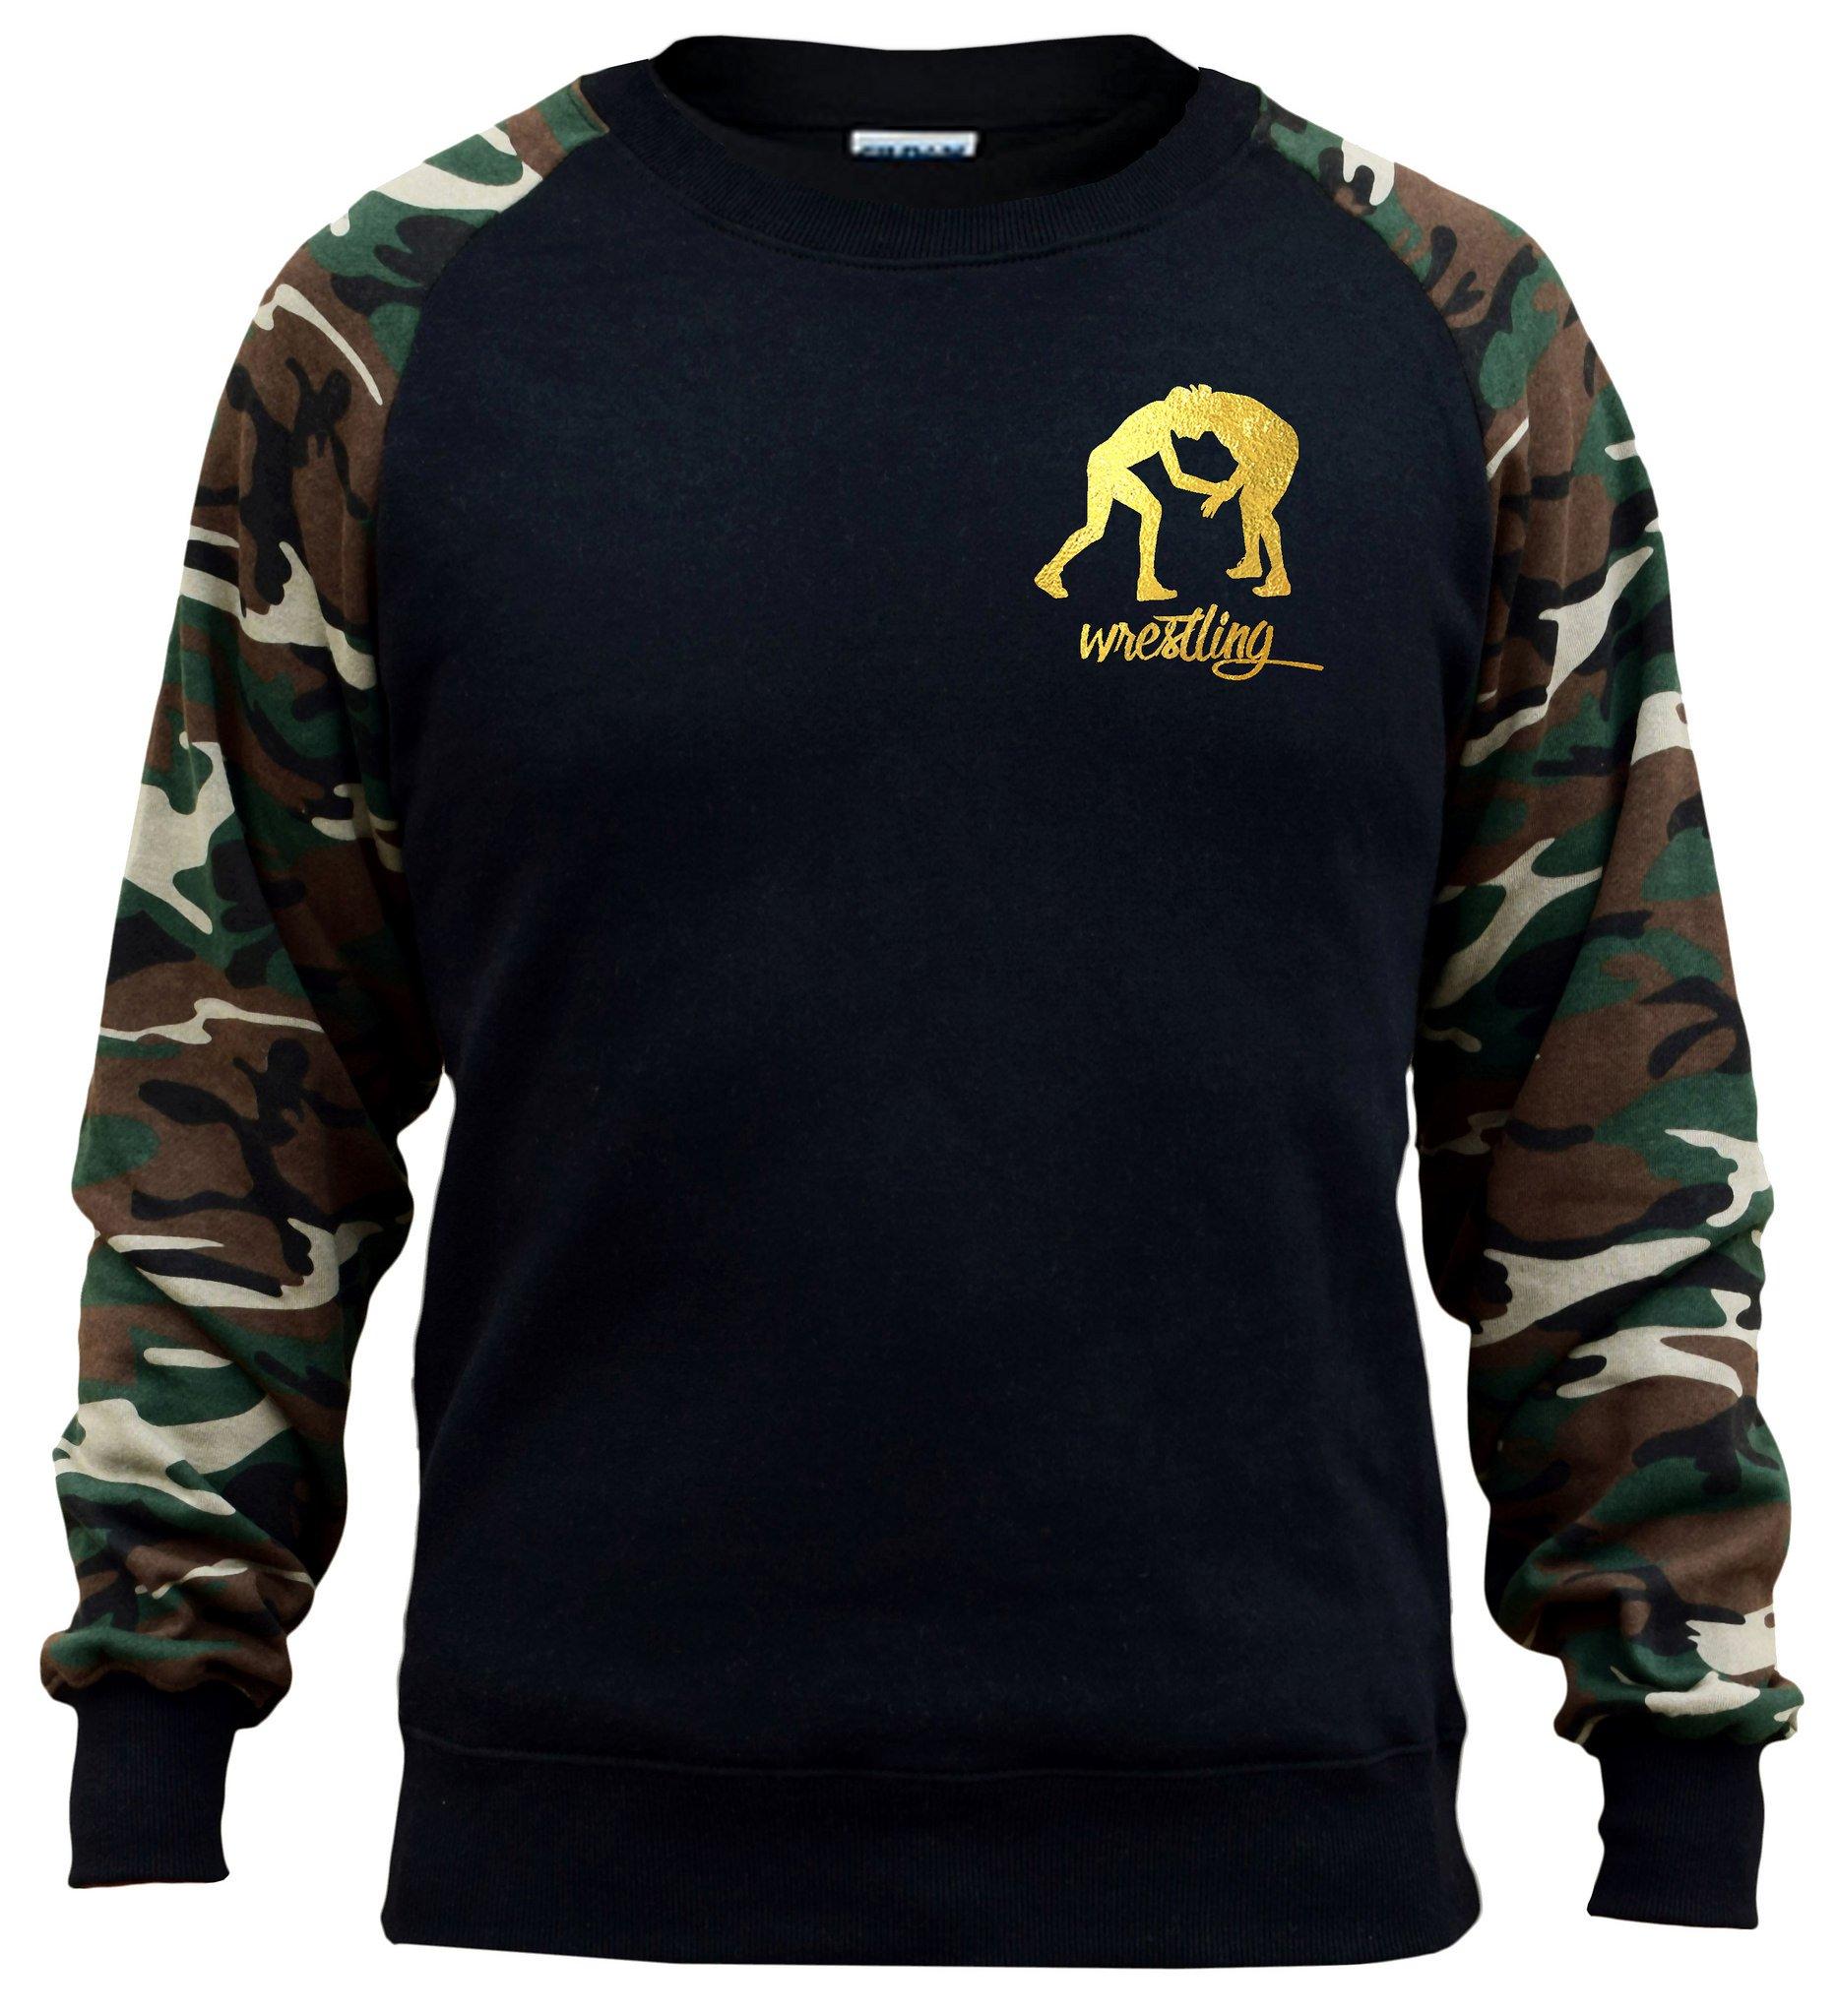 Men's Gold Foil Wrestling Emblem Black/Camo Raglan Baseball Sweatshirt Small Black